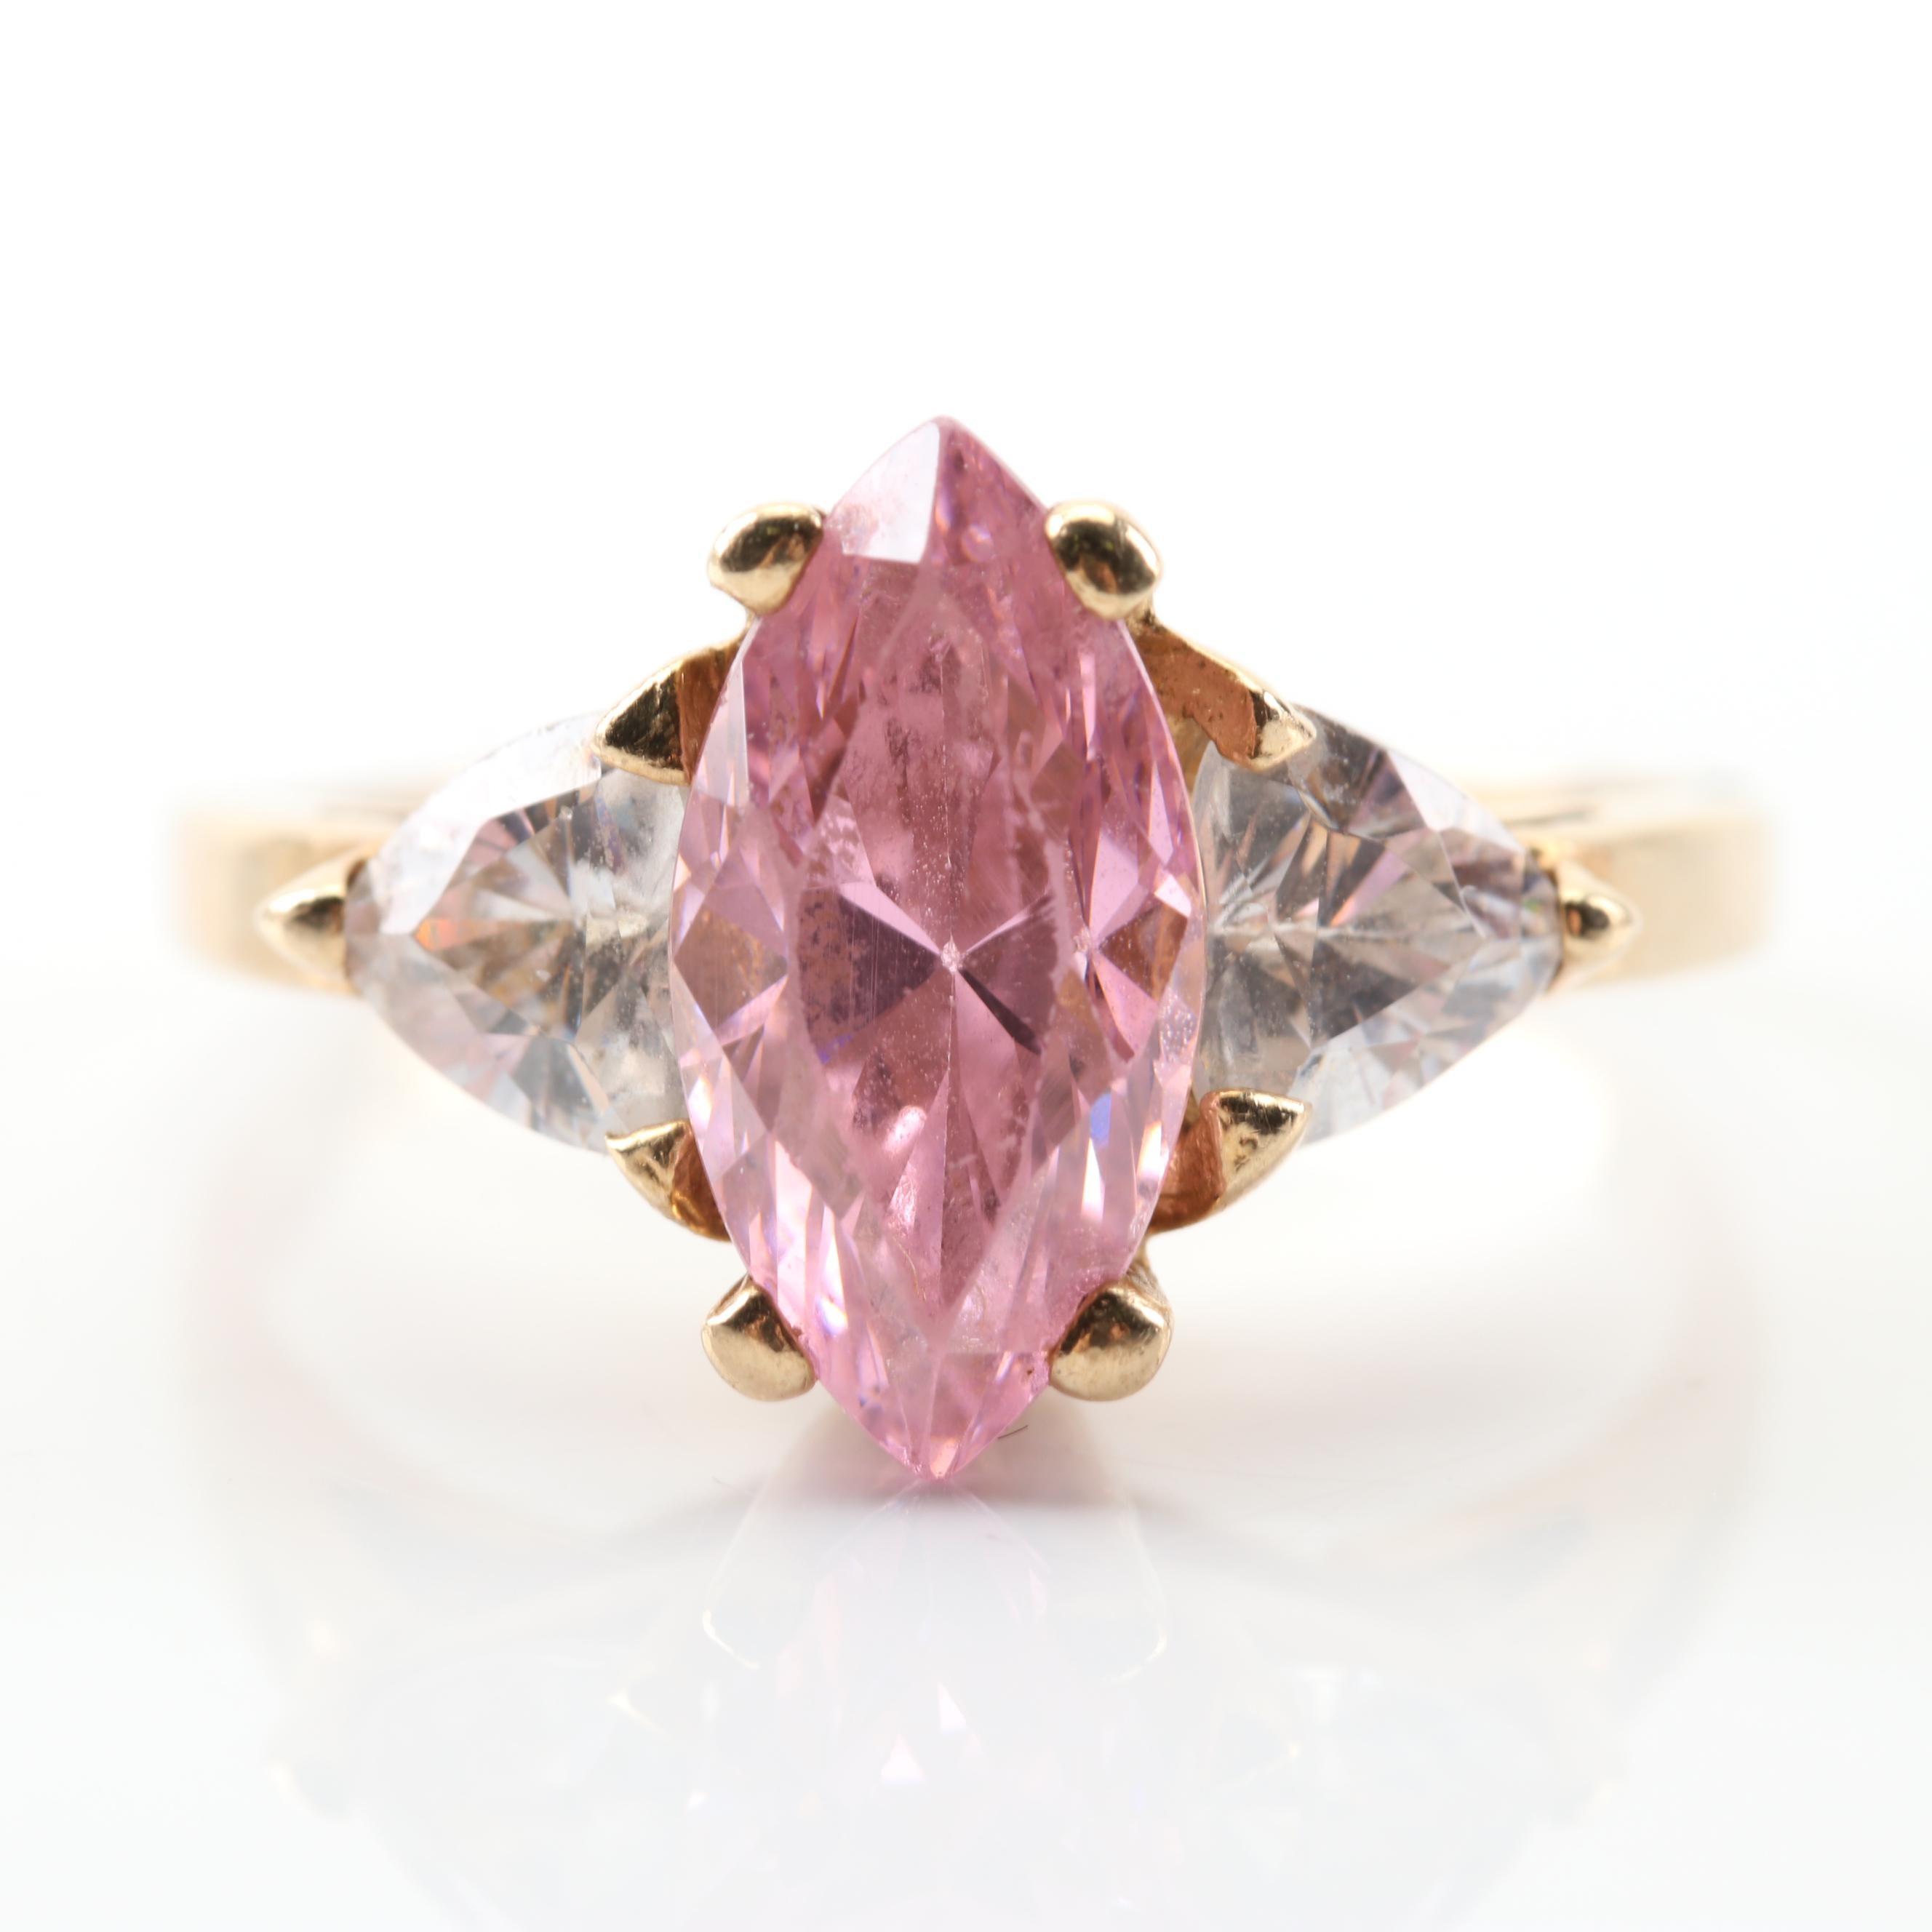 10K Yellow Gold Pink Cubic Zirconia Ring